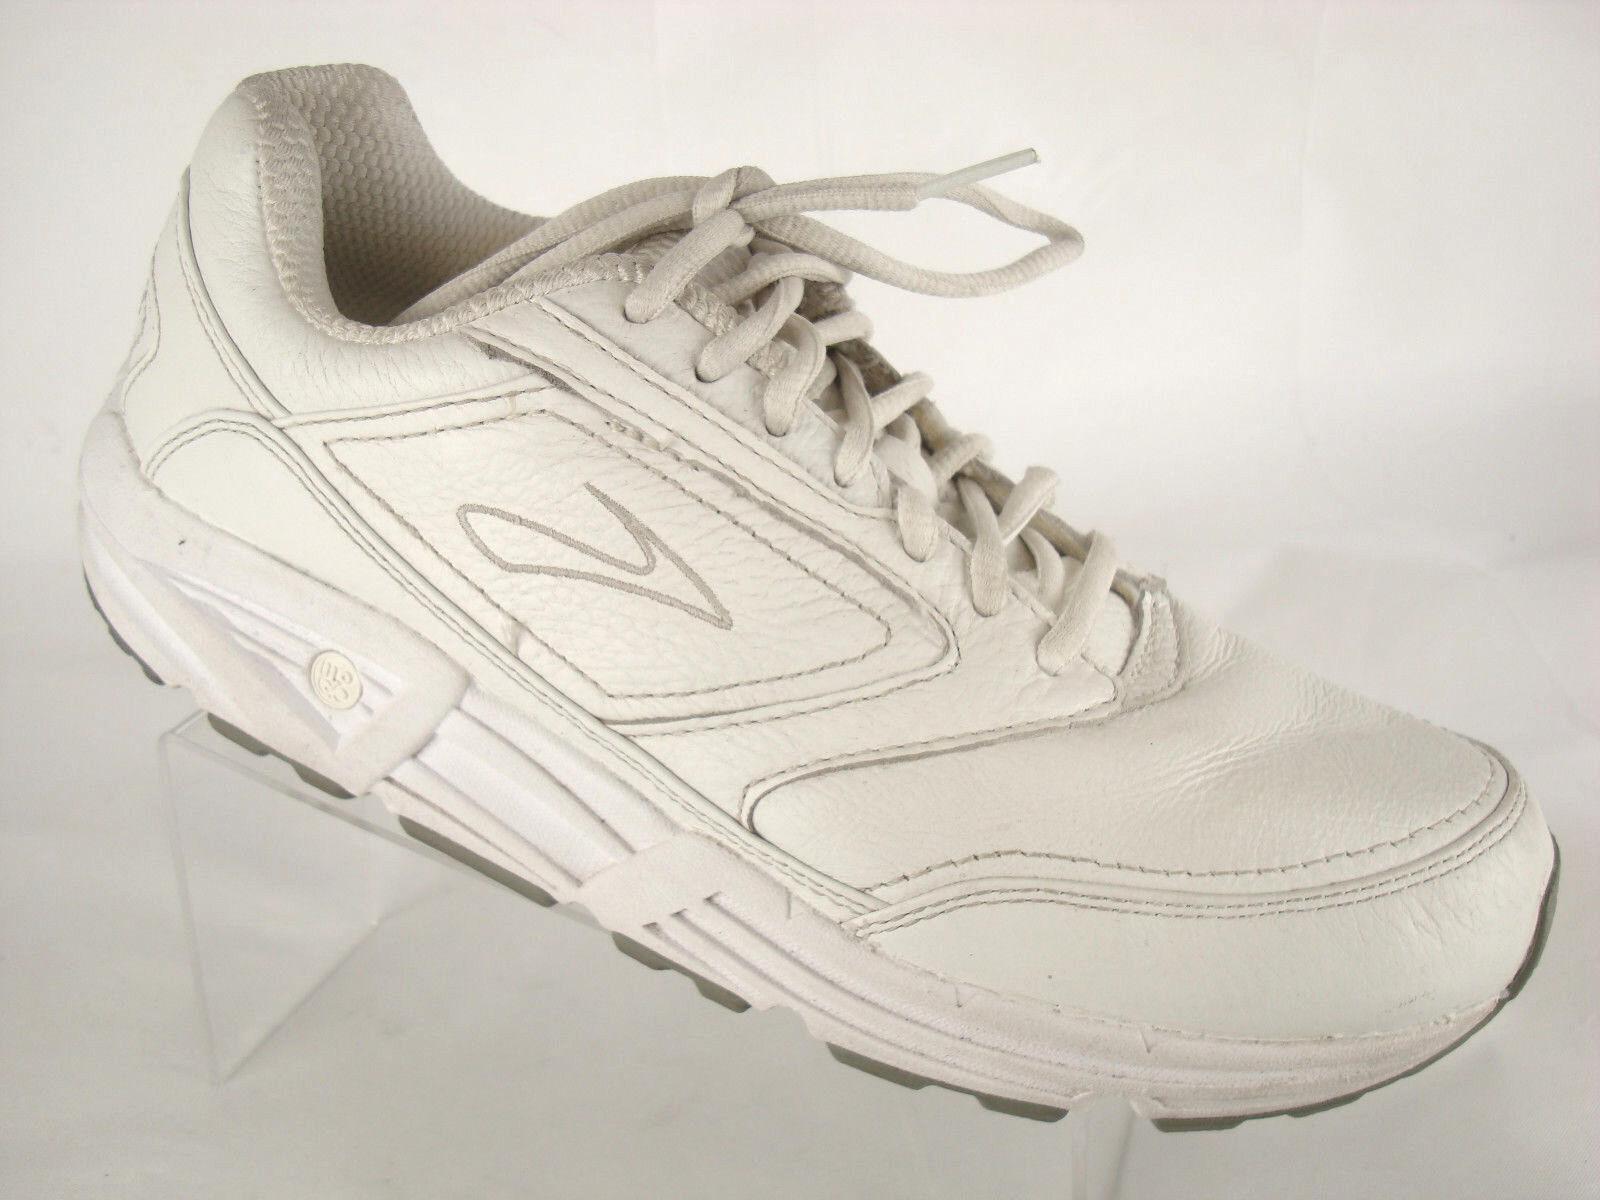 Brooks Addiction Walker Sneakers Linear Platform Platform Platform White Leather Womens Sz 10.5AA a508cf